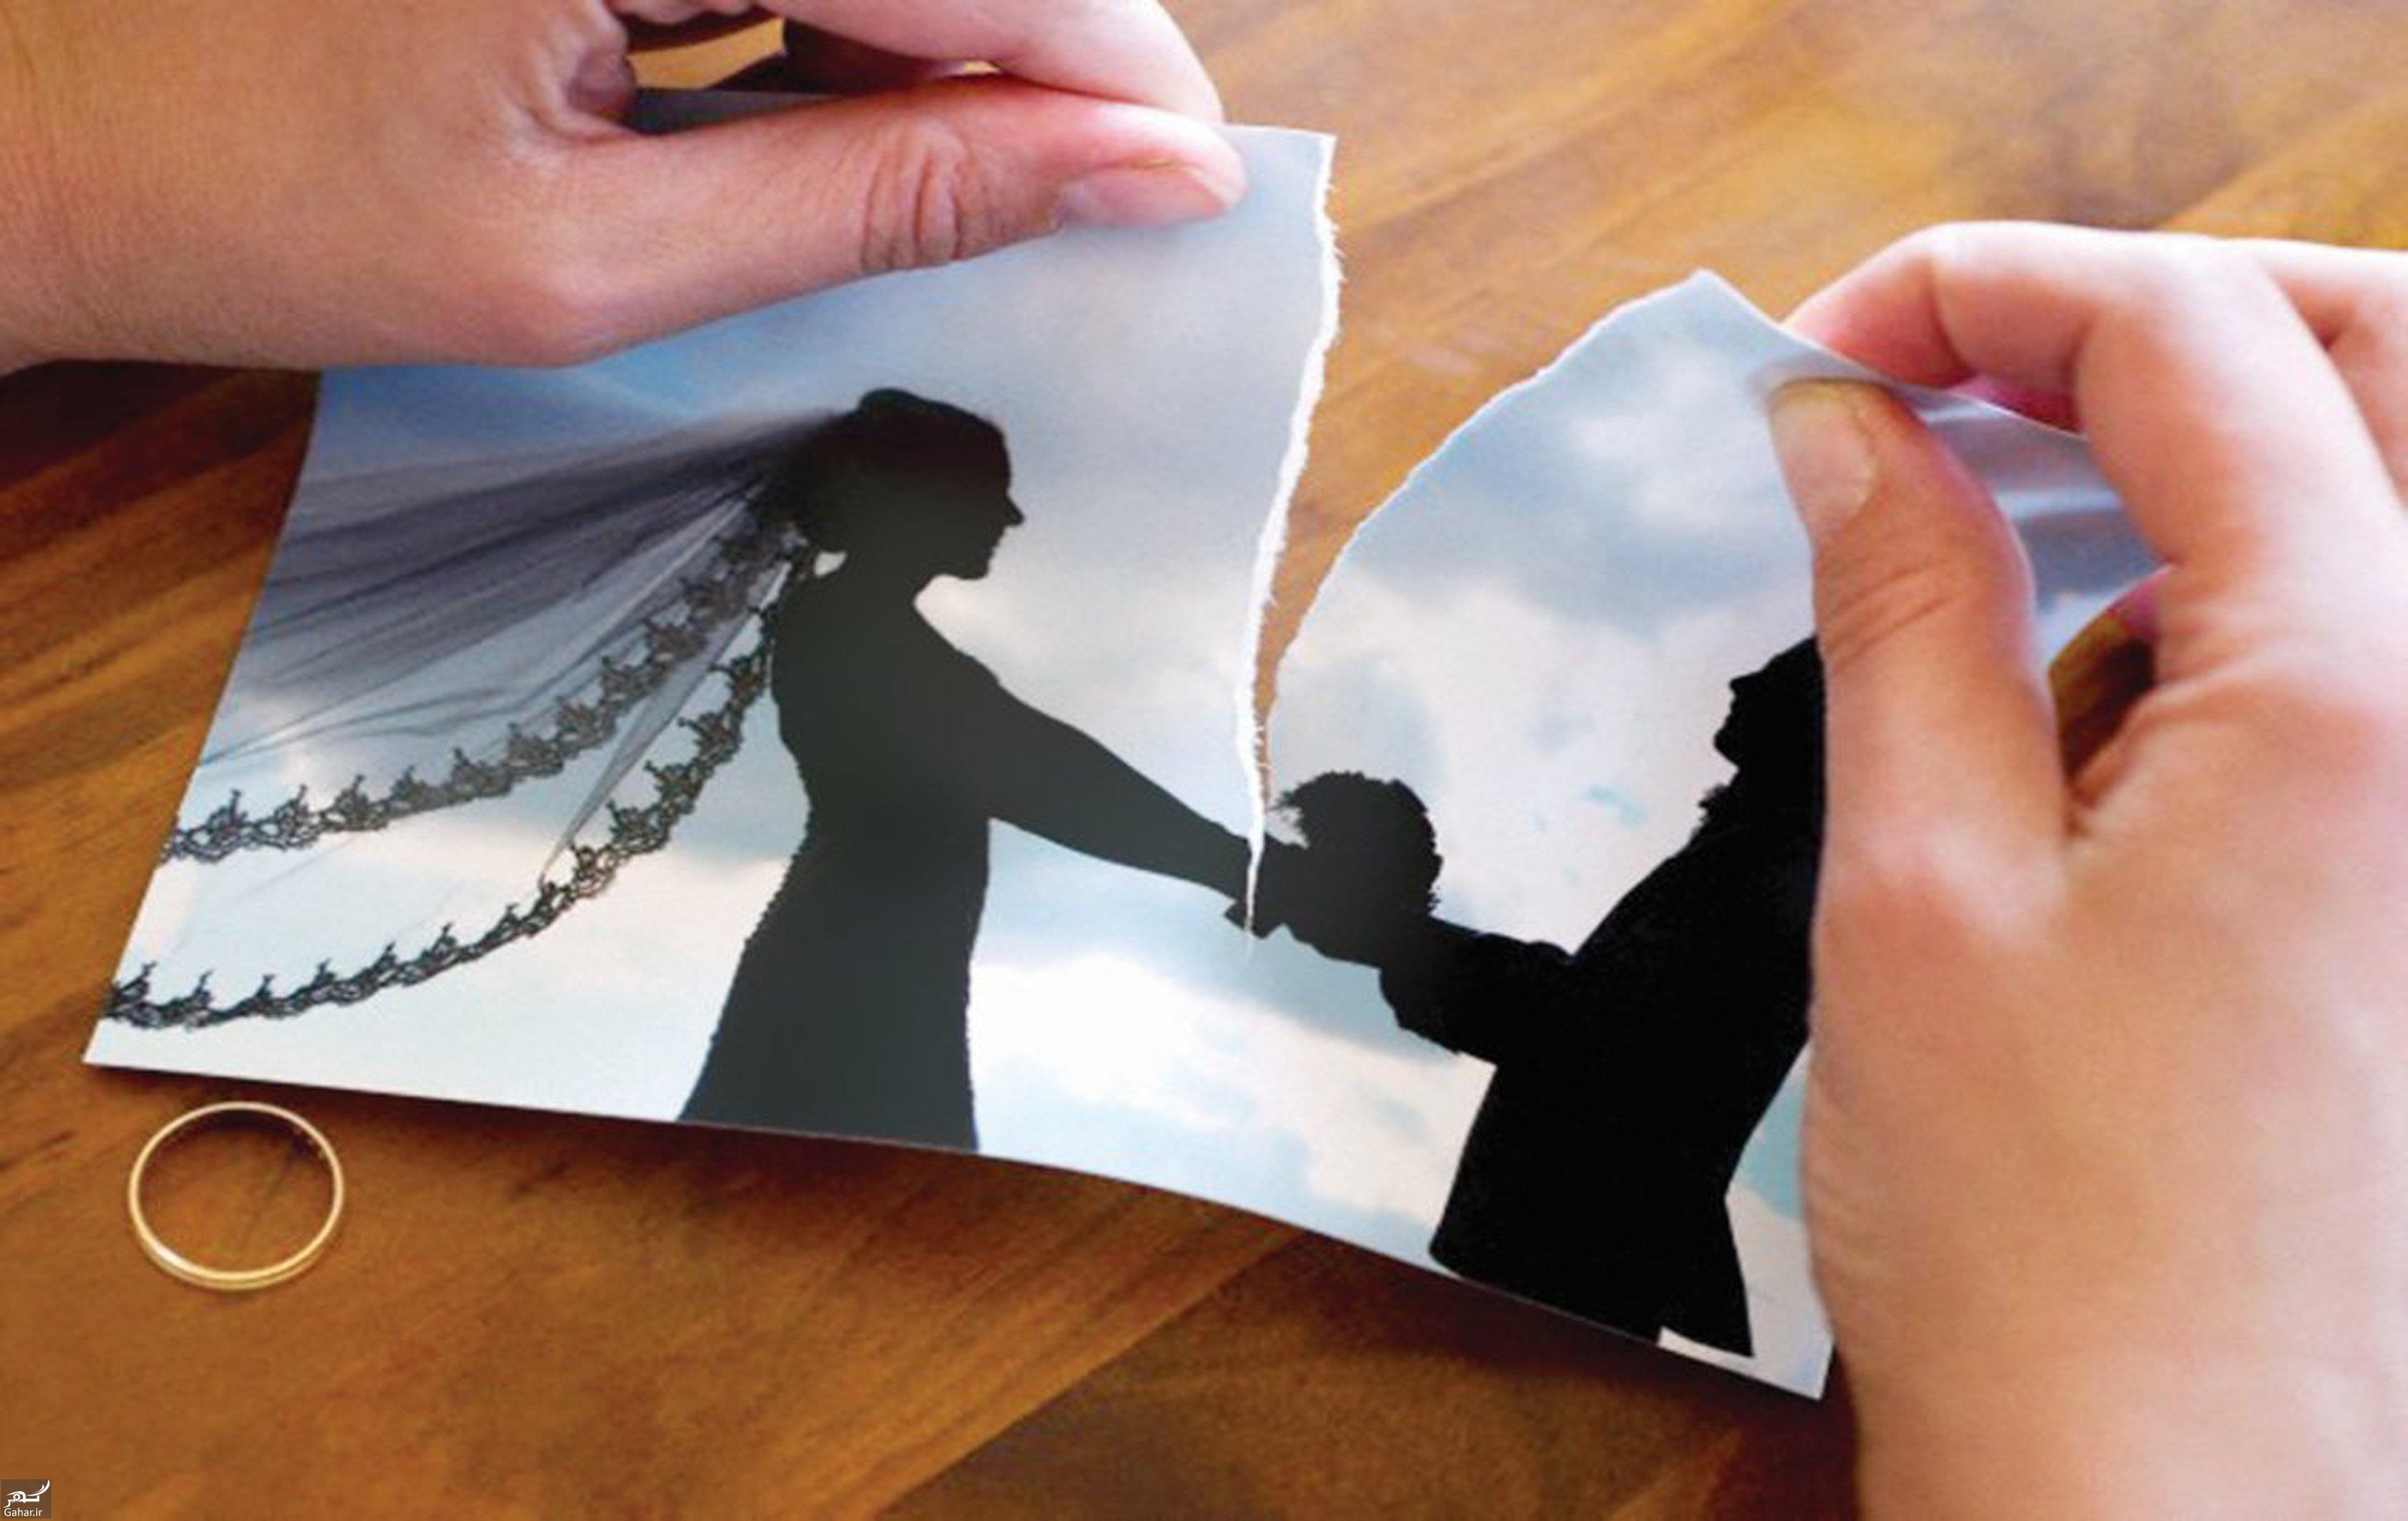 455128 787 اثرات طلاق روی مردان چگونه است؟